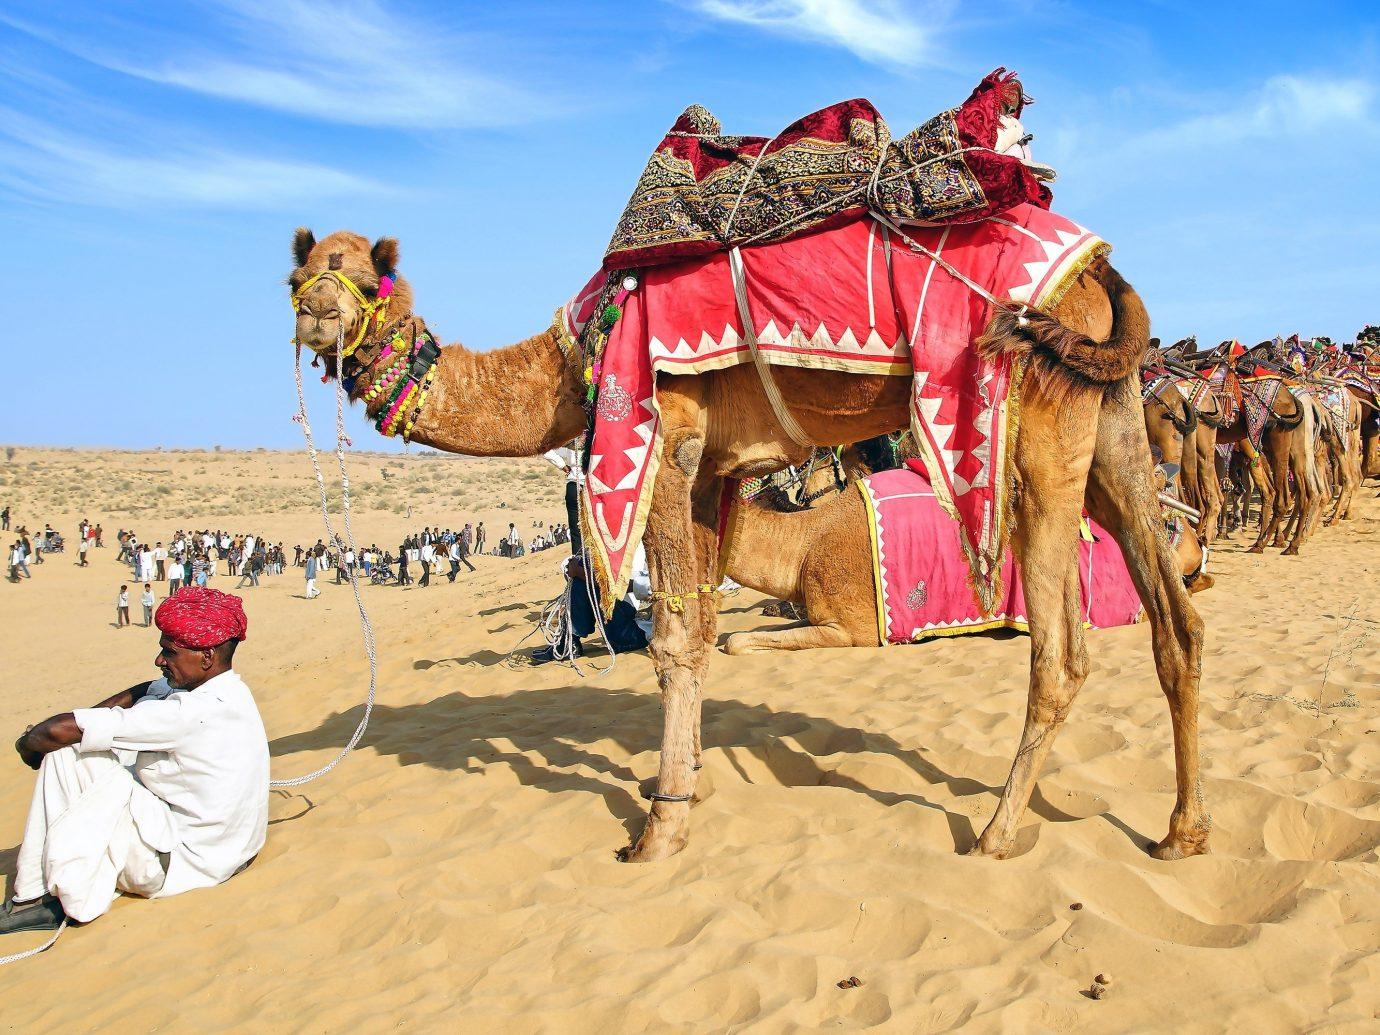 Jetsetter Guides sky Camel outdoor natural environment camel like mammal arabian camel sahara Desert landscape aeolian landform erg sand several